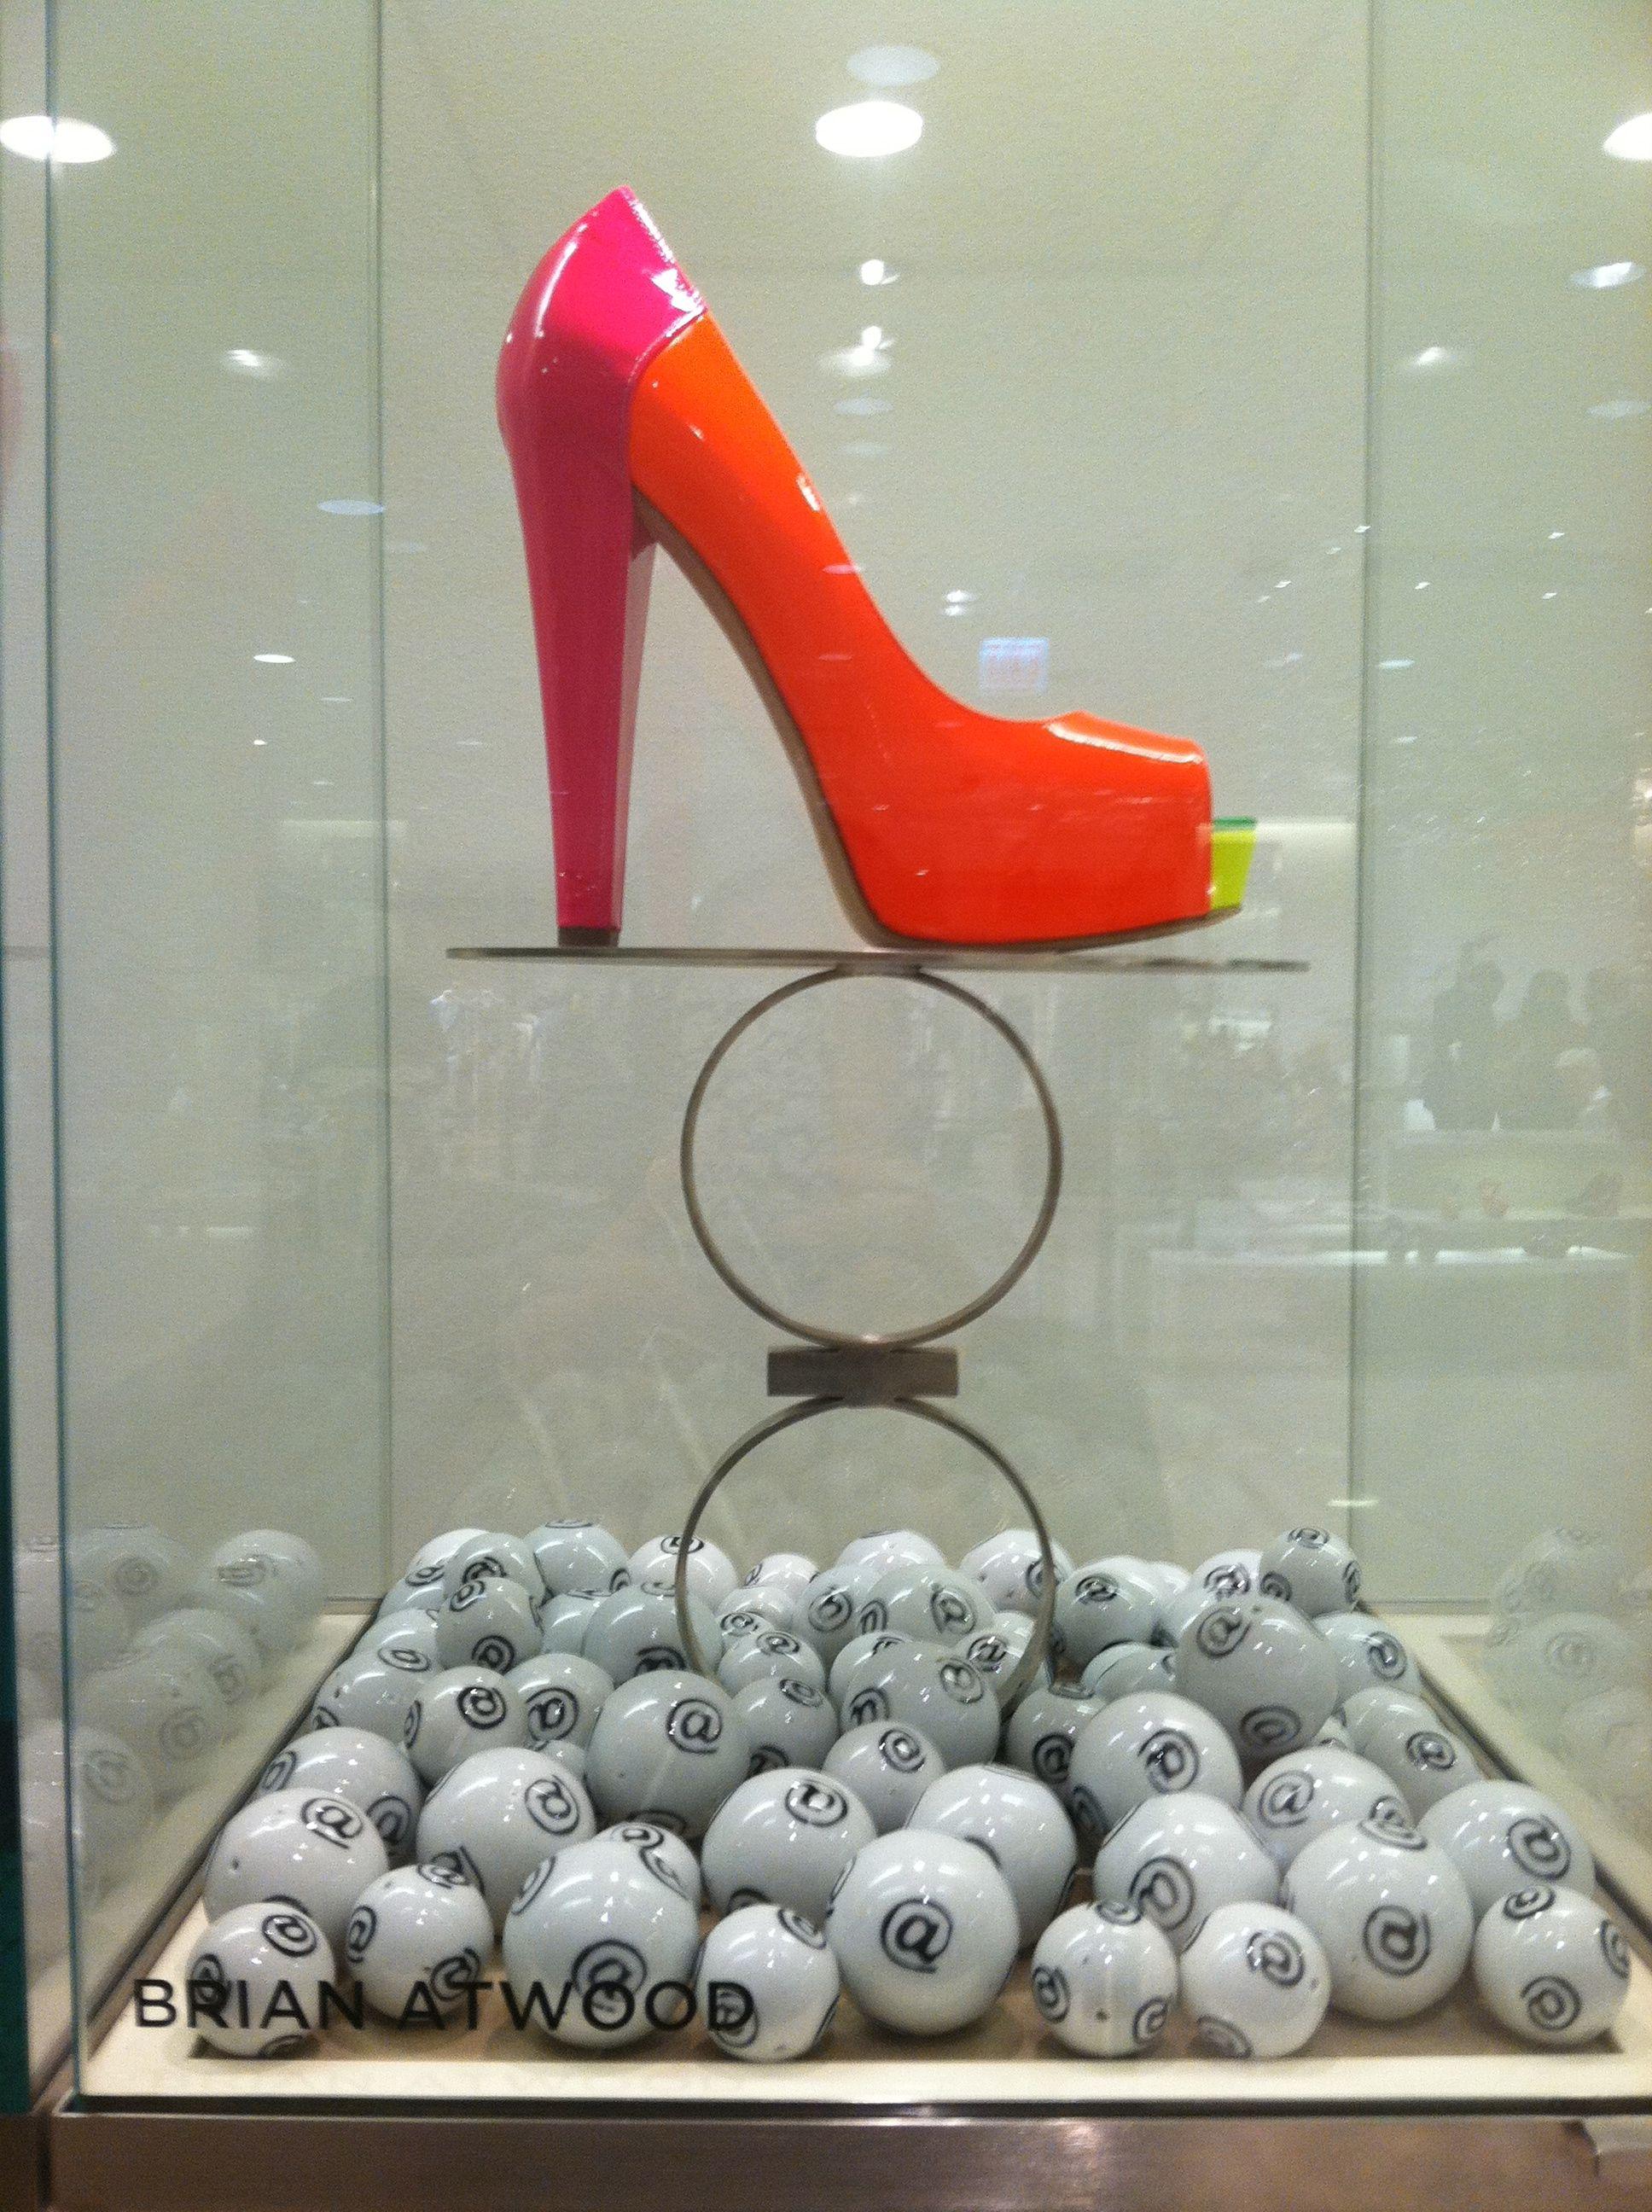 #brianatwood NEON shoes! @Saks Fifth Avenue #Imaluxurylady